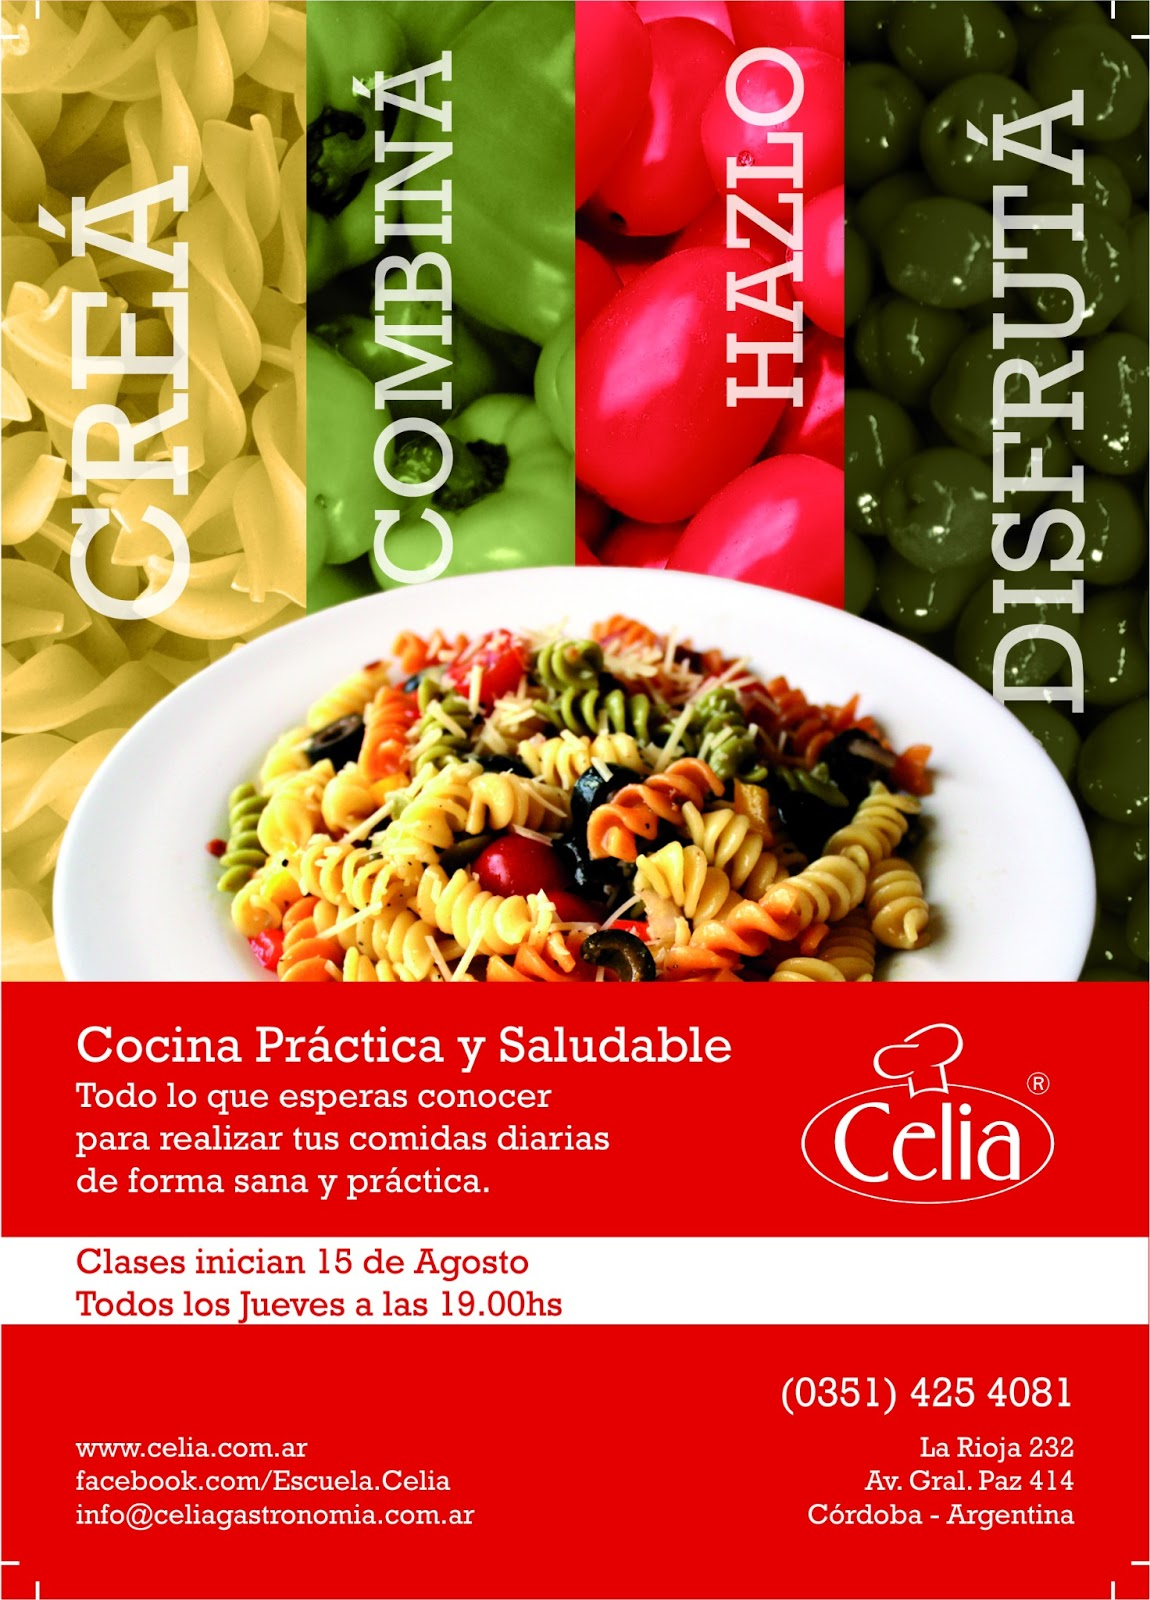 Celia Escuela Integral Gastronomica Julio 2013